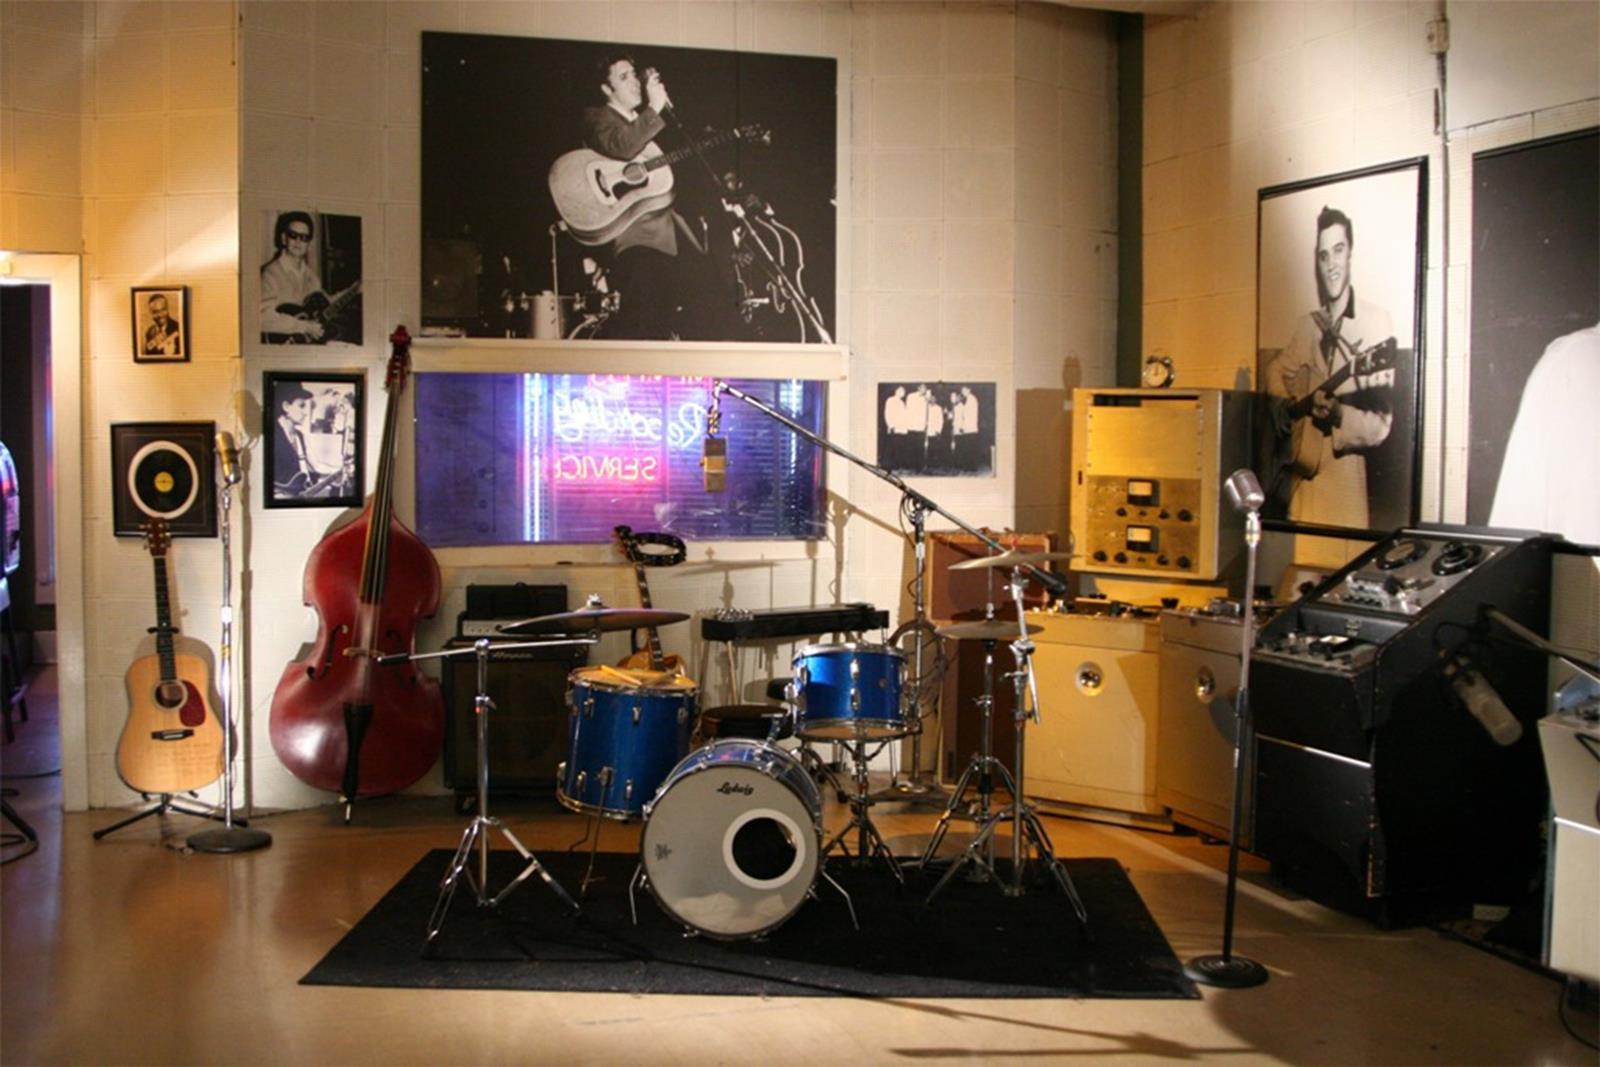 Inside the studio. Credit: Sun Studios